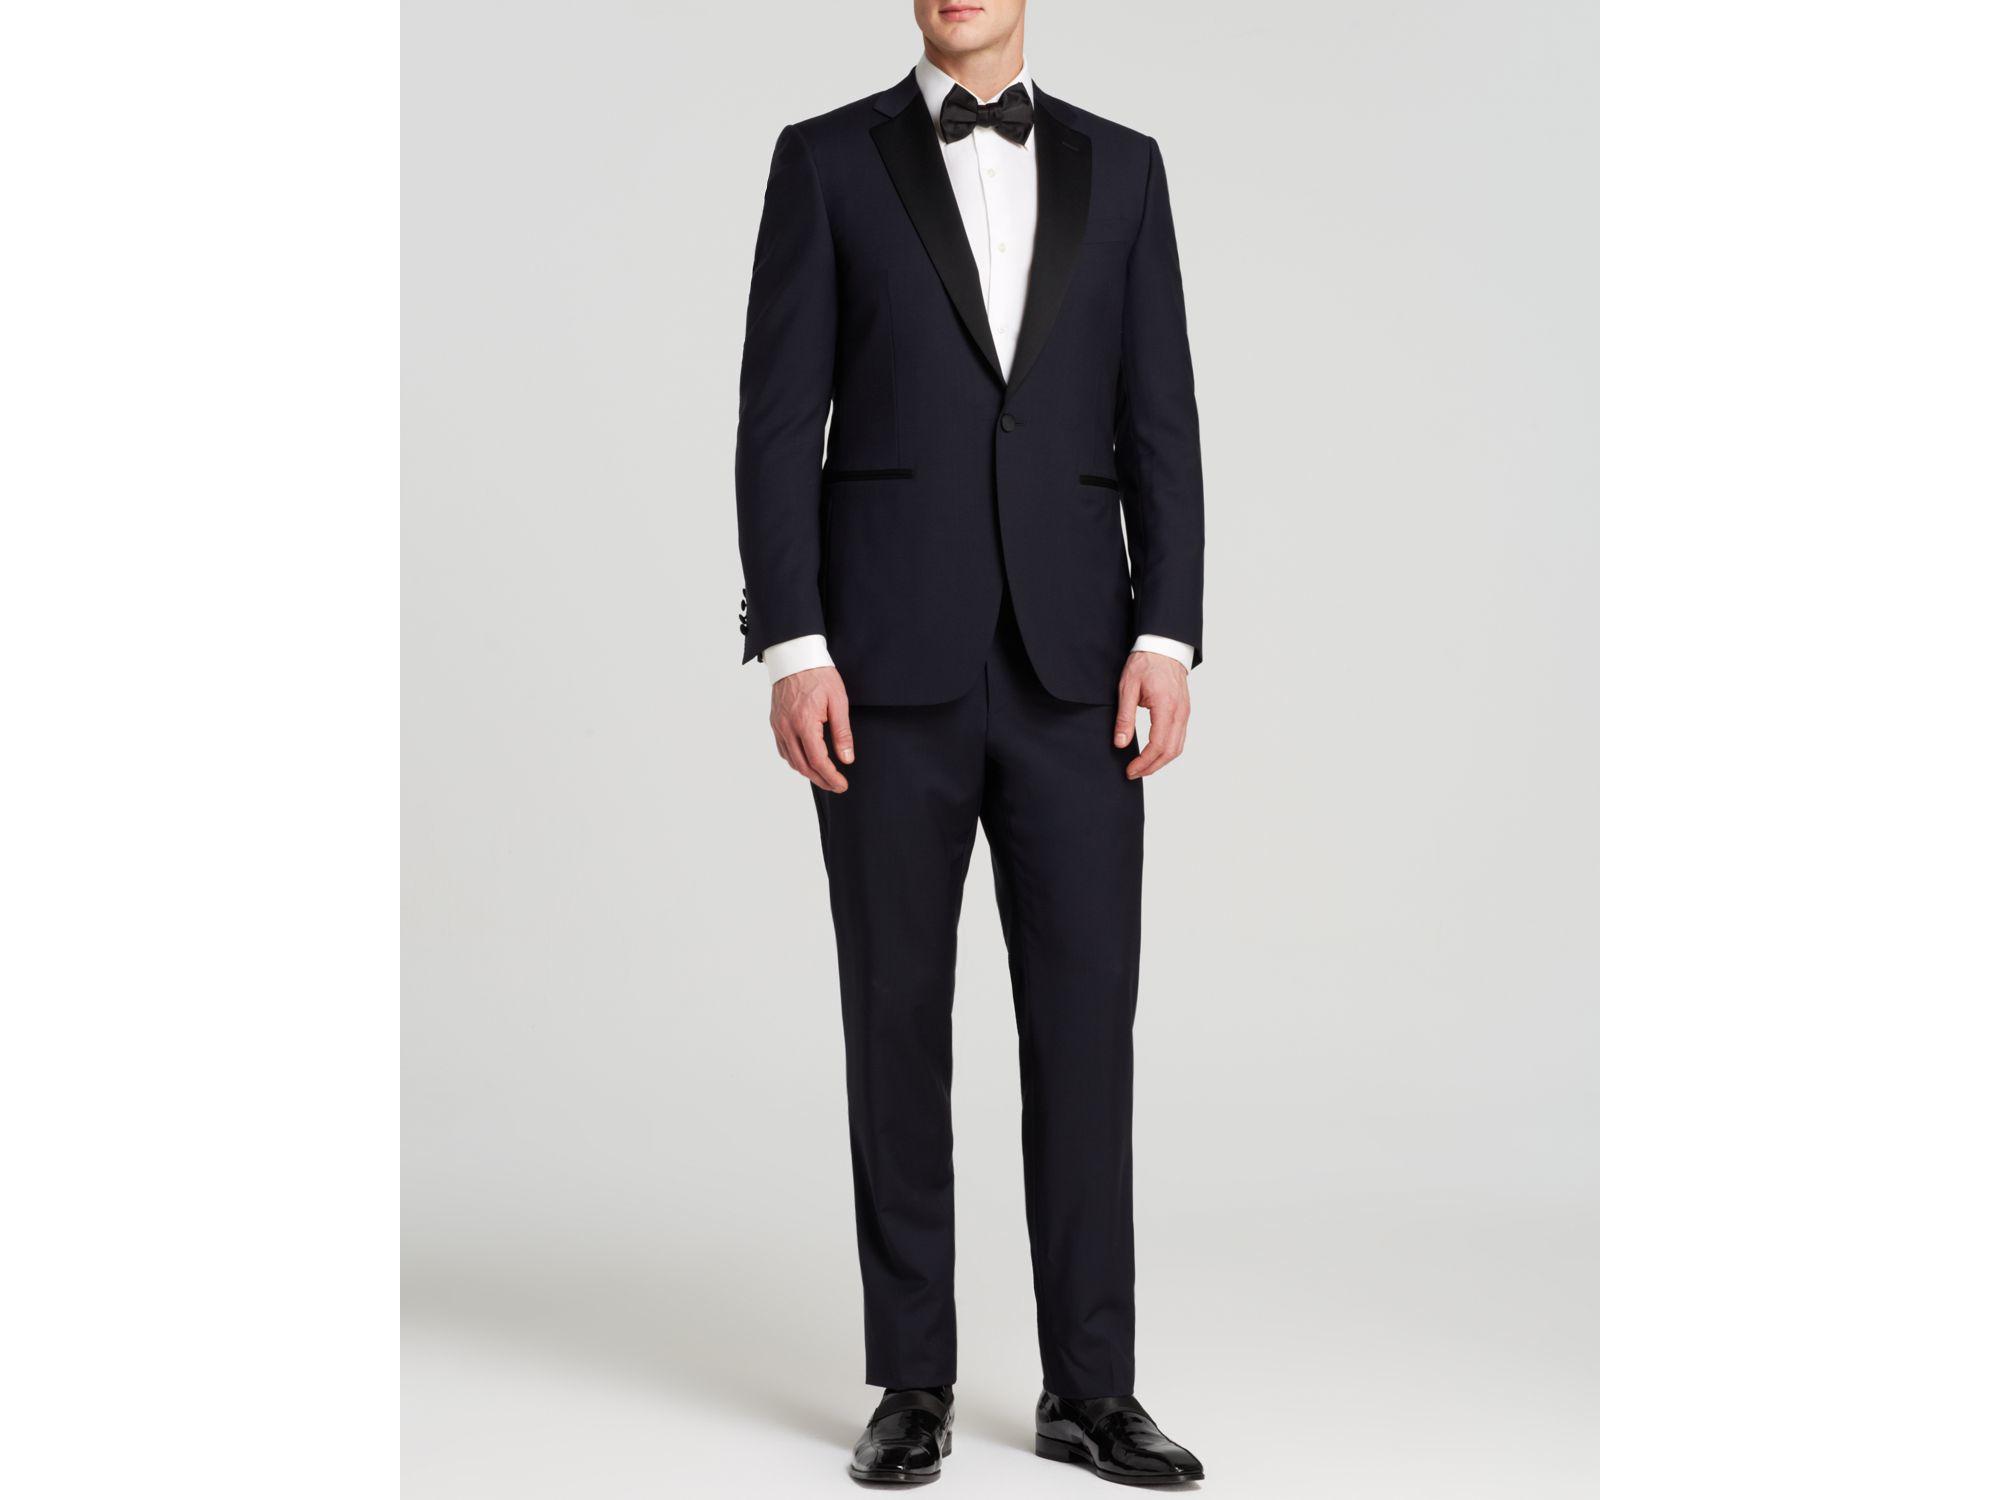 b051c705e8d33b Canali Firenze Basic Tuxedo - Classic Fit - Bloomingdale's Exclusive ...